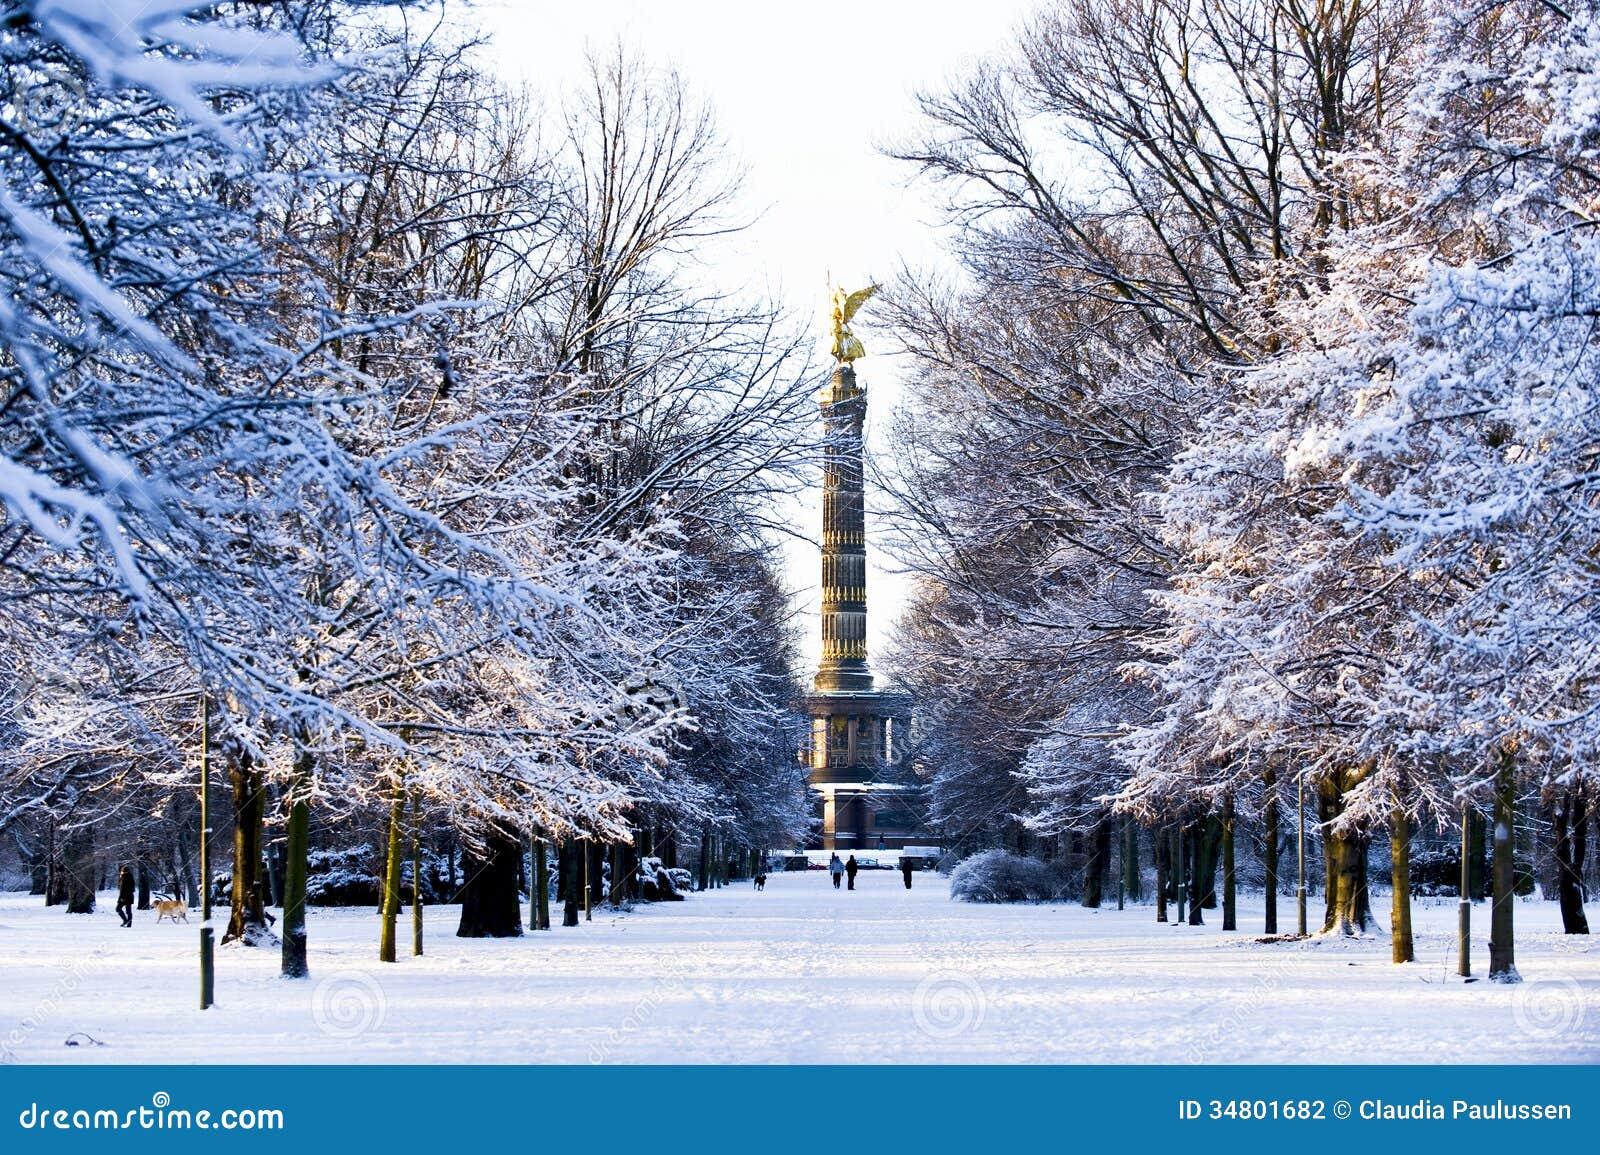 winter in berlin stock photo image of nature golden